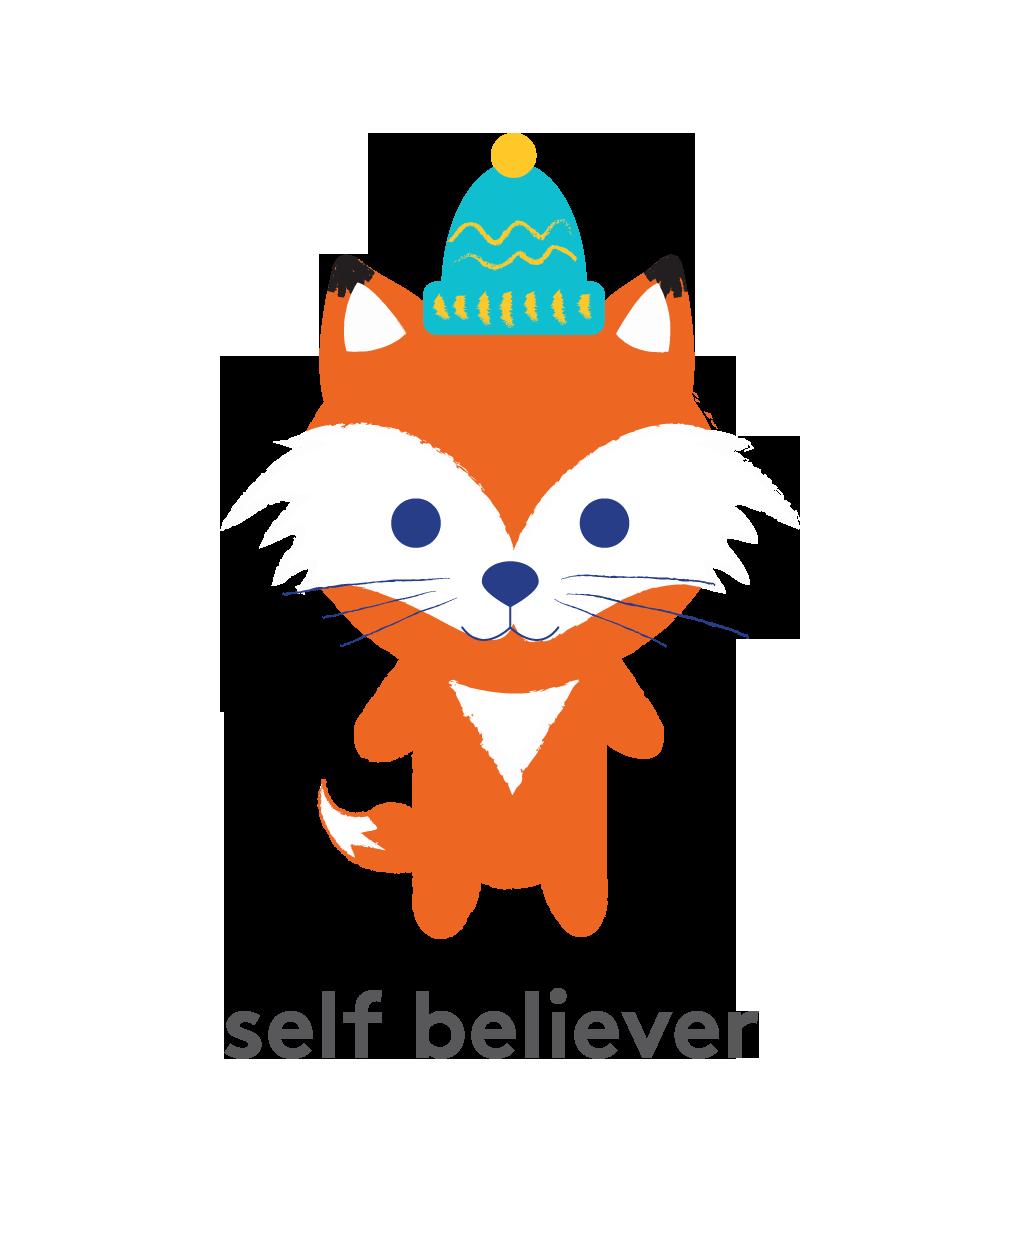 Fox: Self Believer